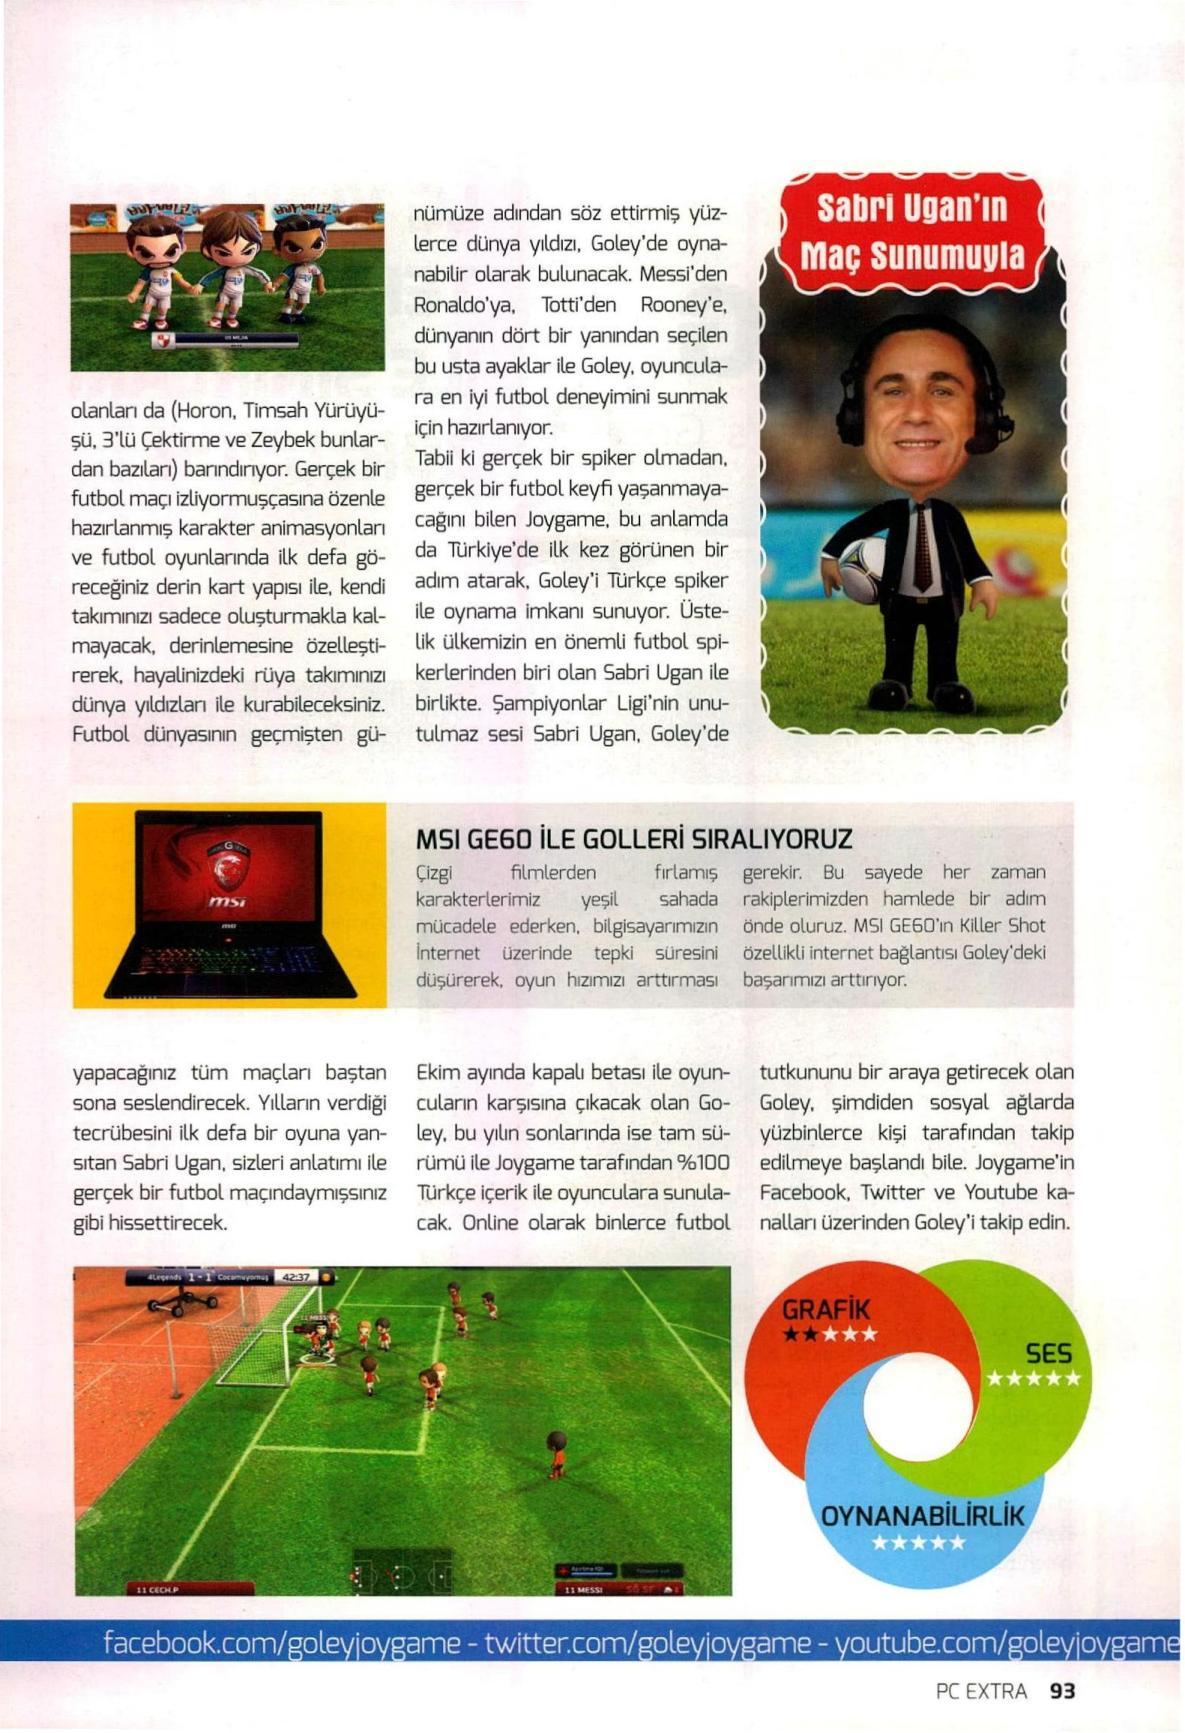 Netmarble-Turkey-PC-Extra-Sayfa-93-01.12.141